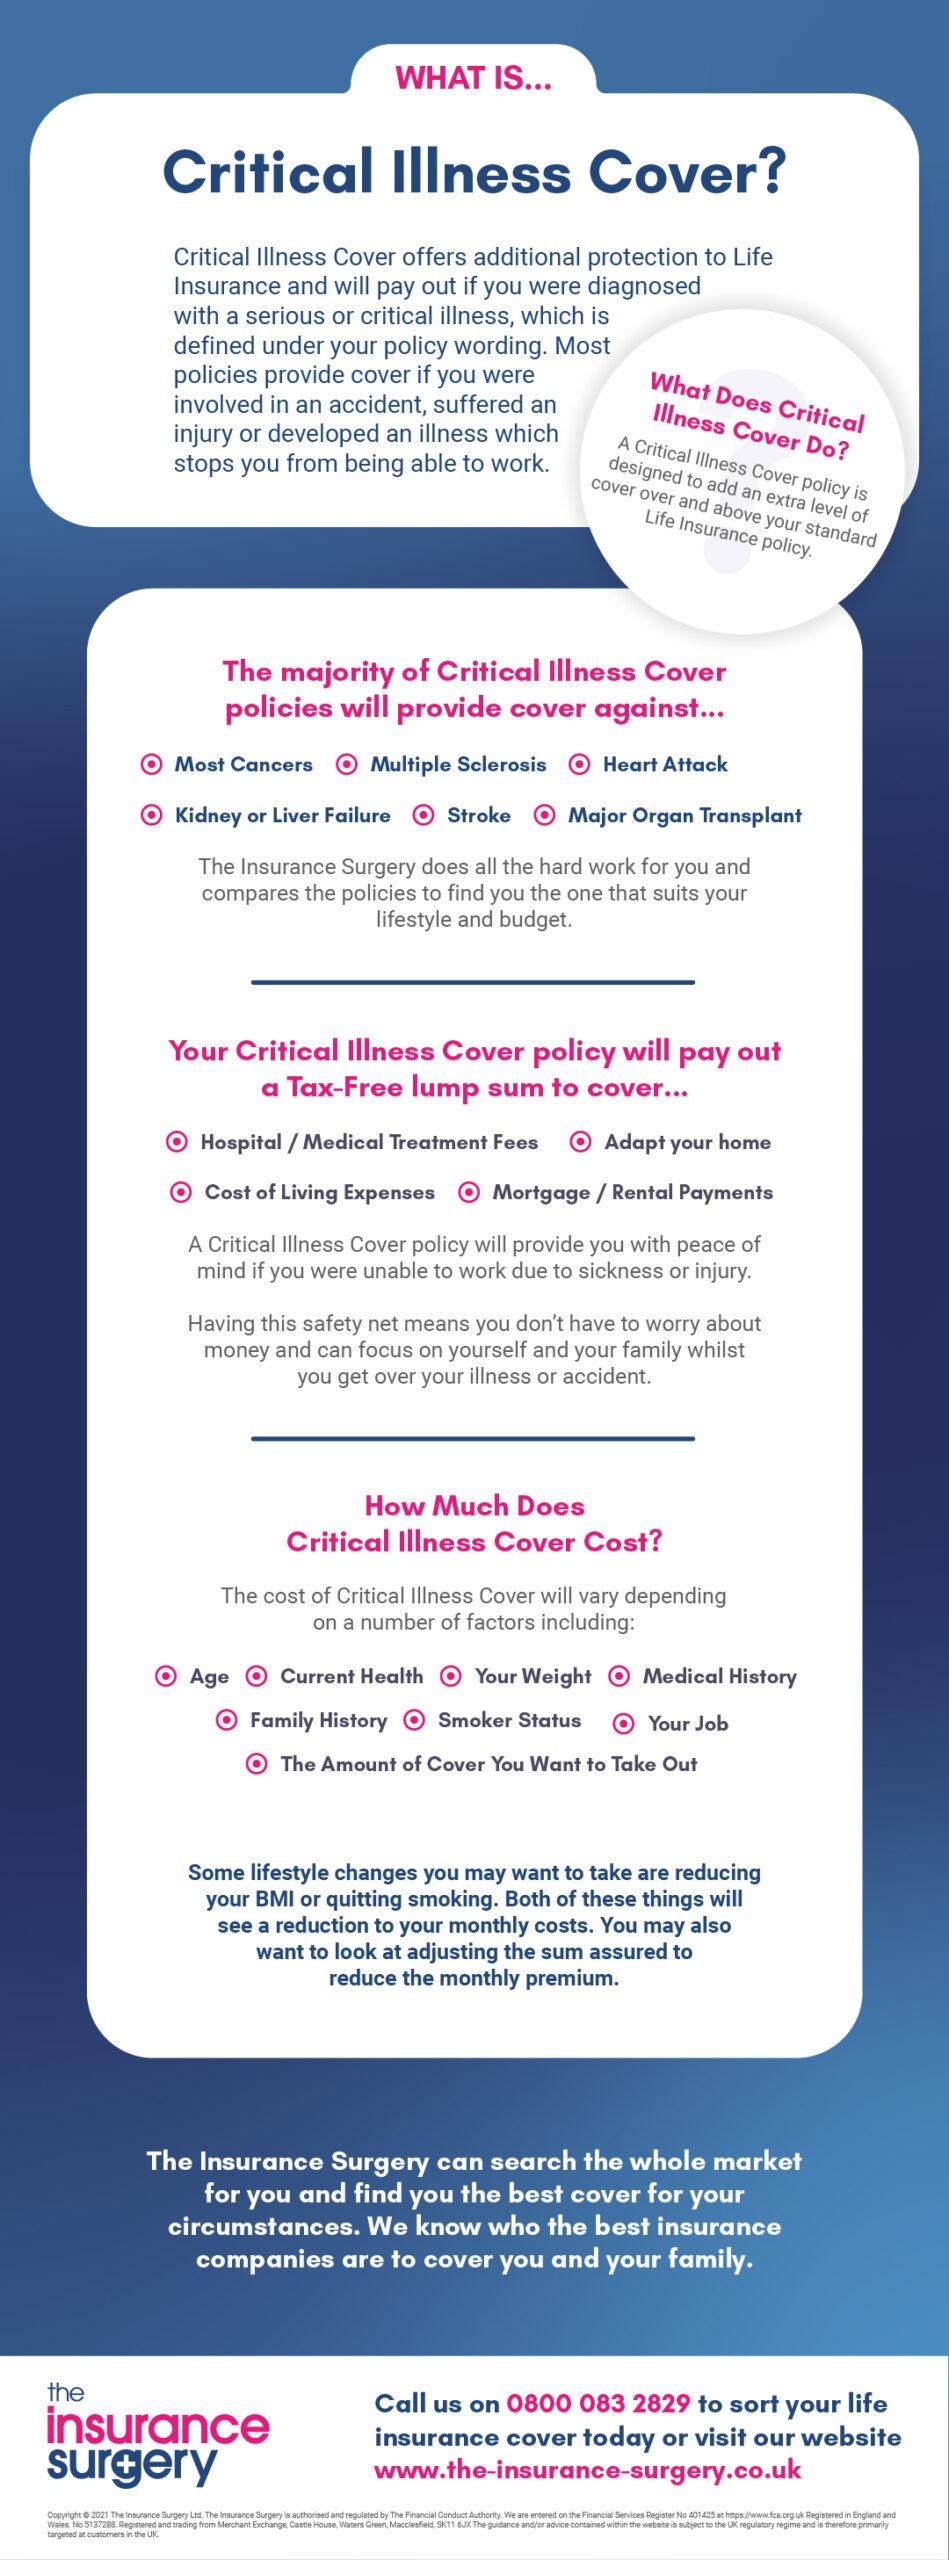 CriticalIllness Infographic 2 01